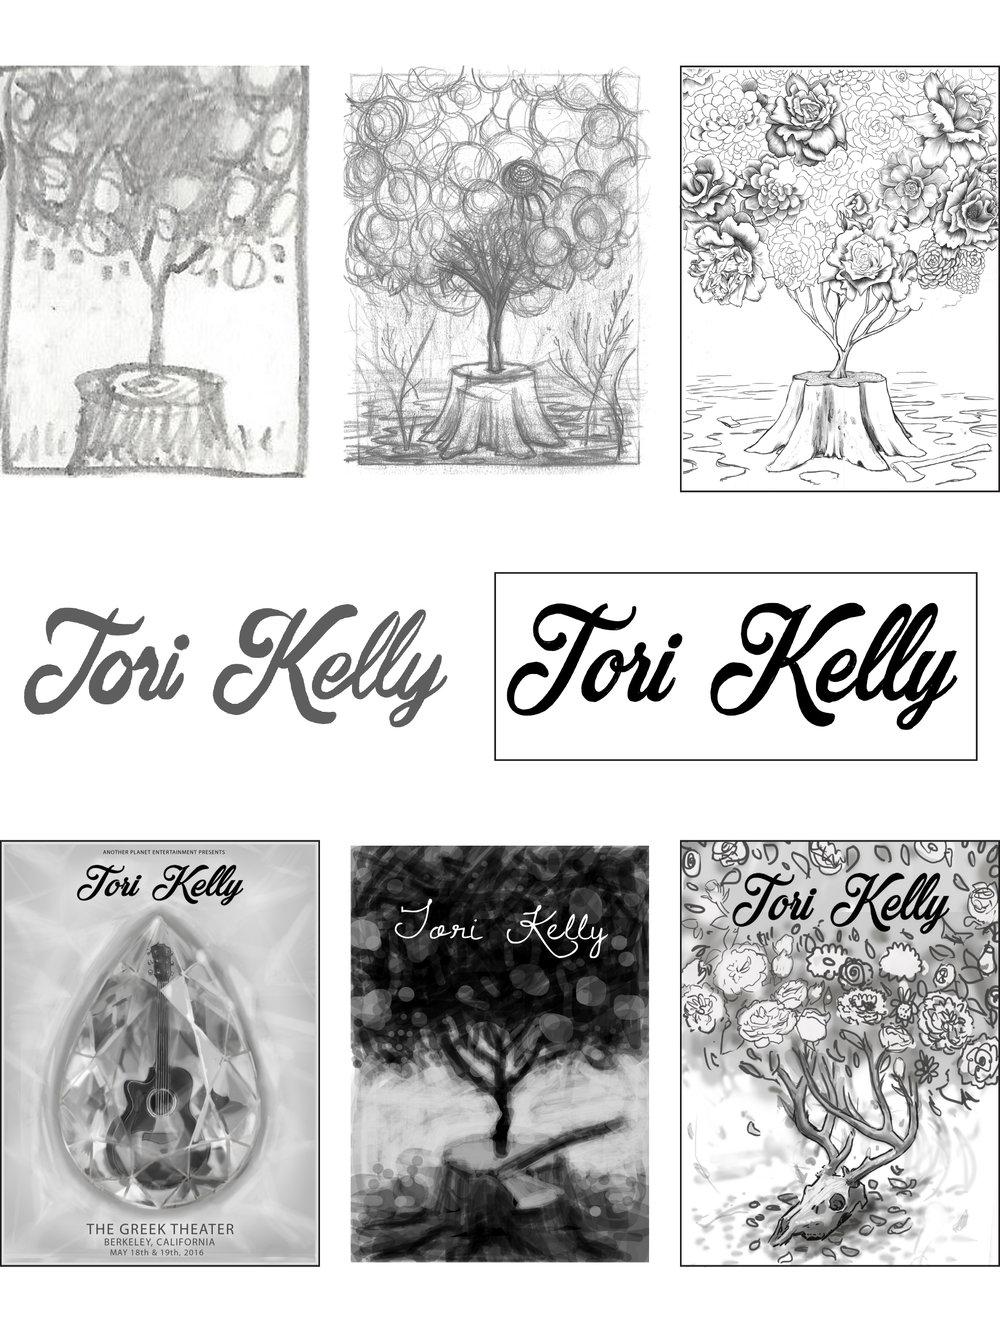 torikelly_sketches.jpg